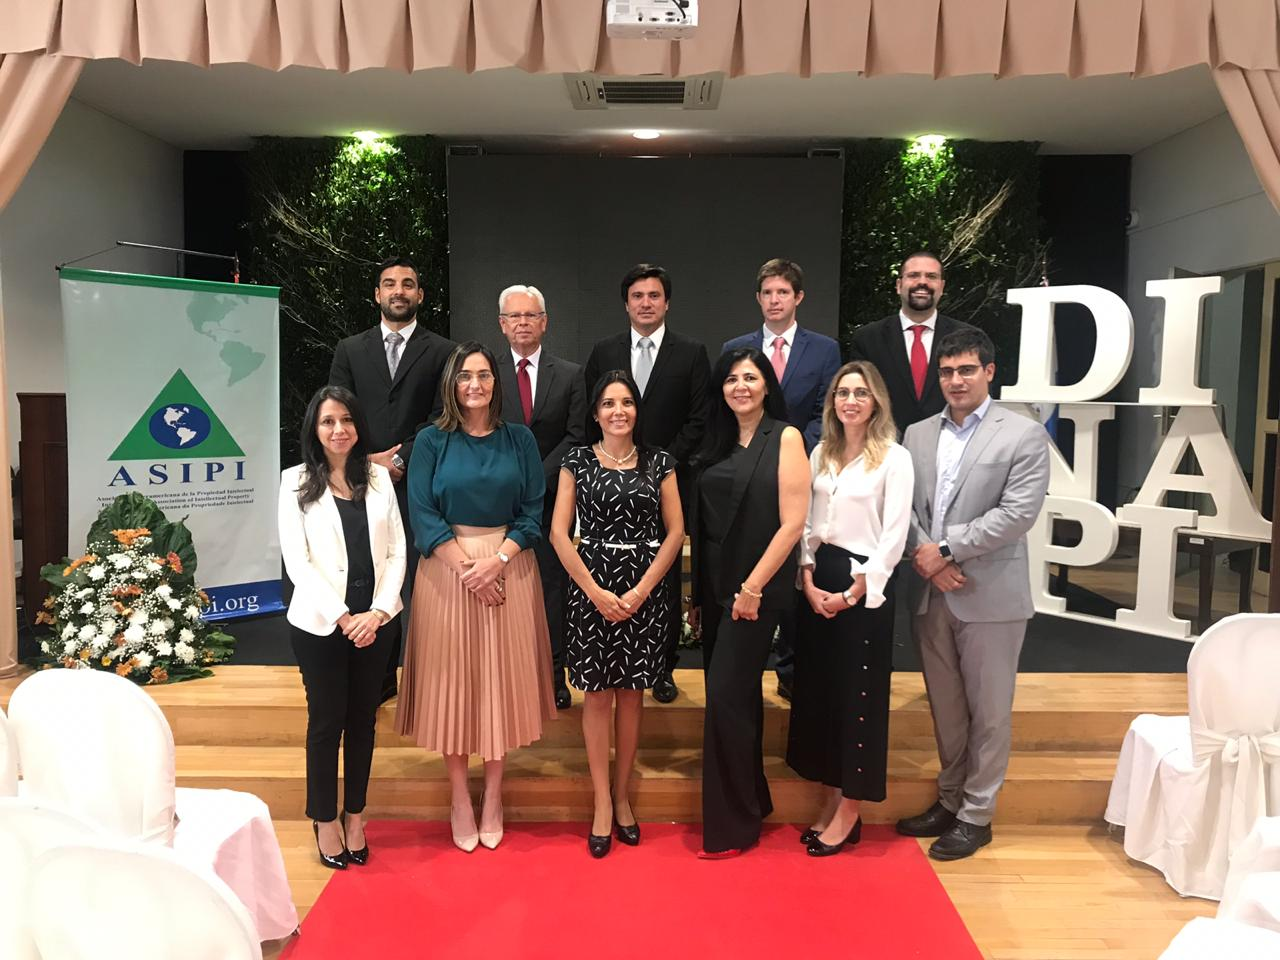 ASIPI-DINAPI Conference in Asuncion